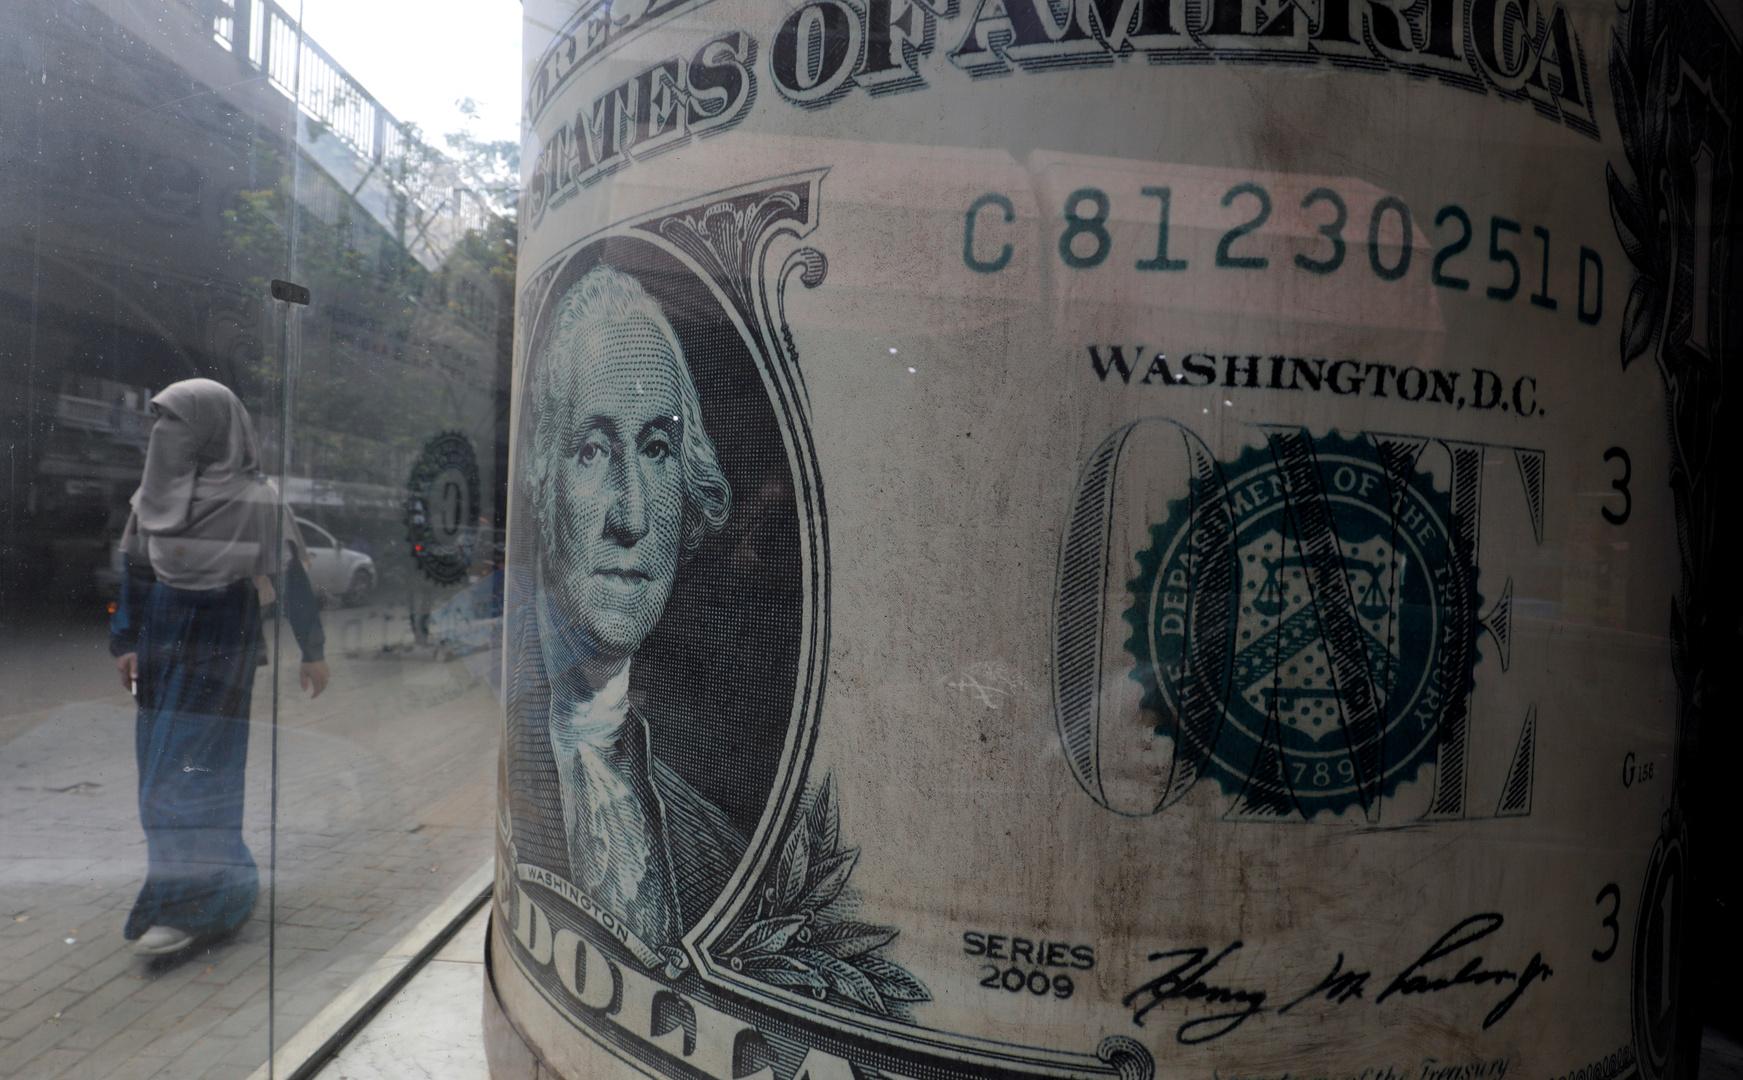 Egypt is seeking to more than a million dollars wearing UAE banks